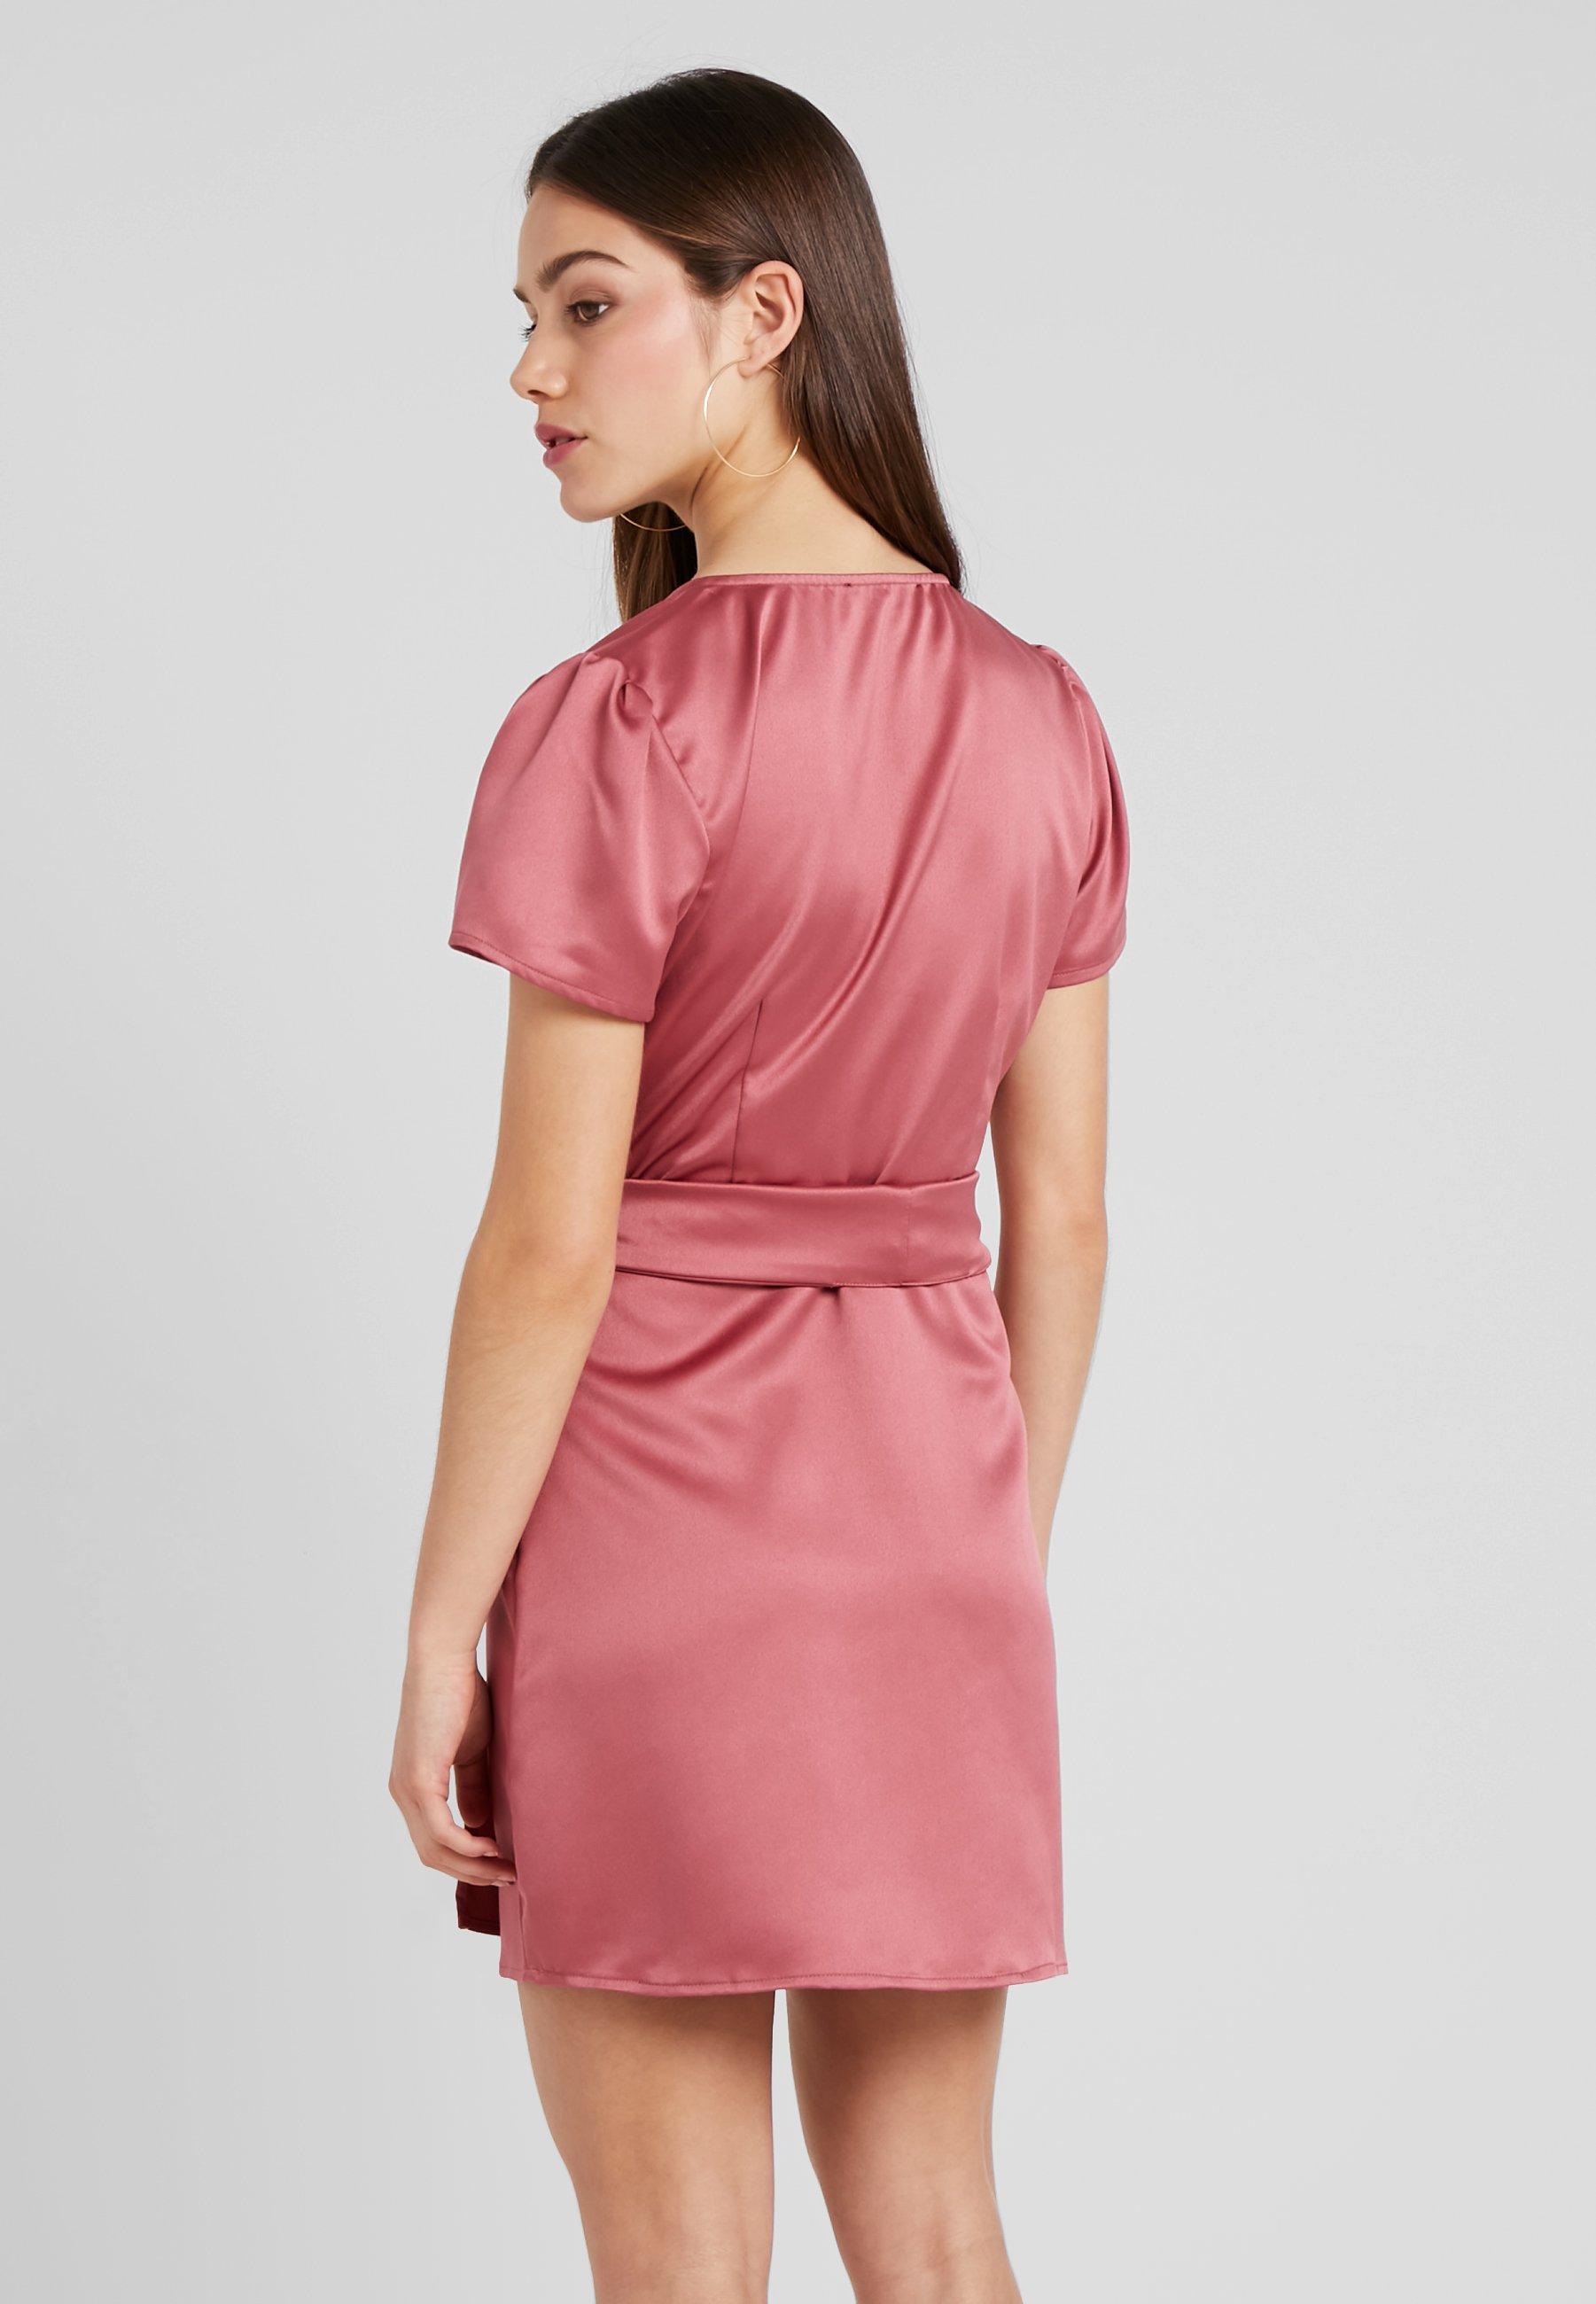 WaistRobe Wrap Union Soirée Dress Pink Fashion With De Petite 35RLq4jA